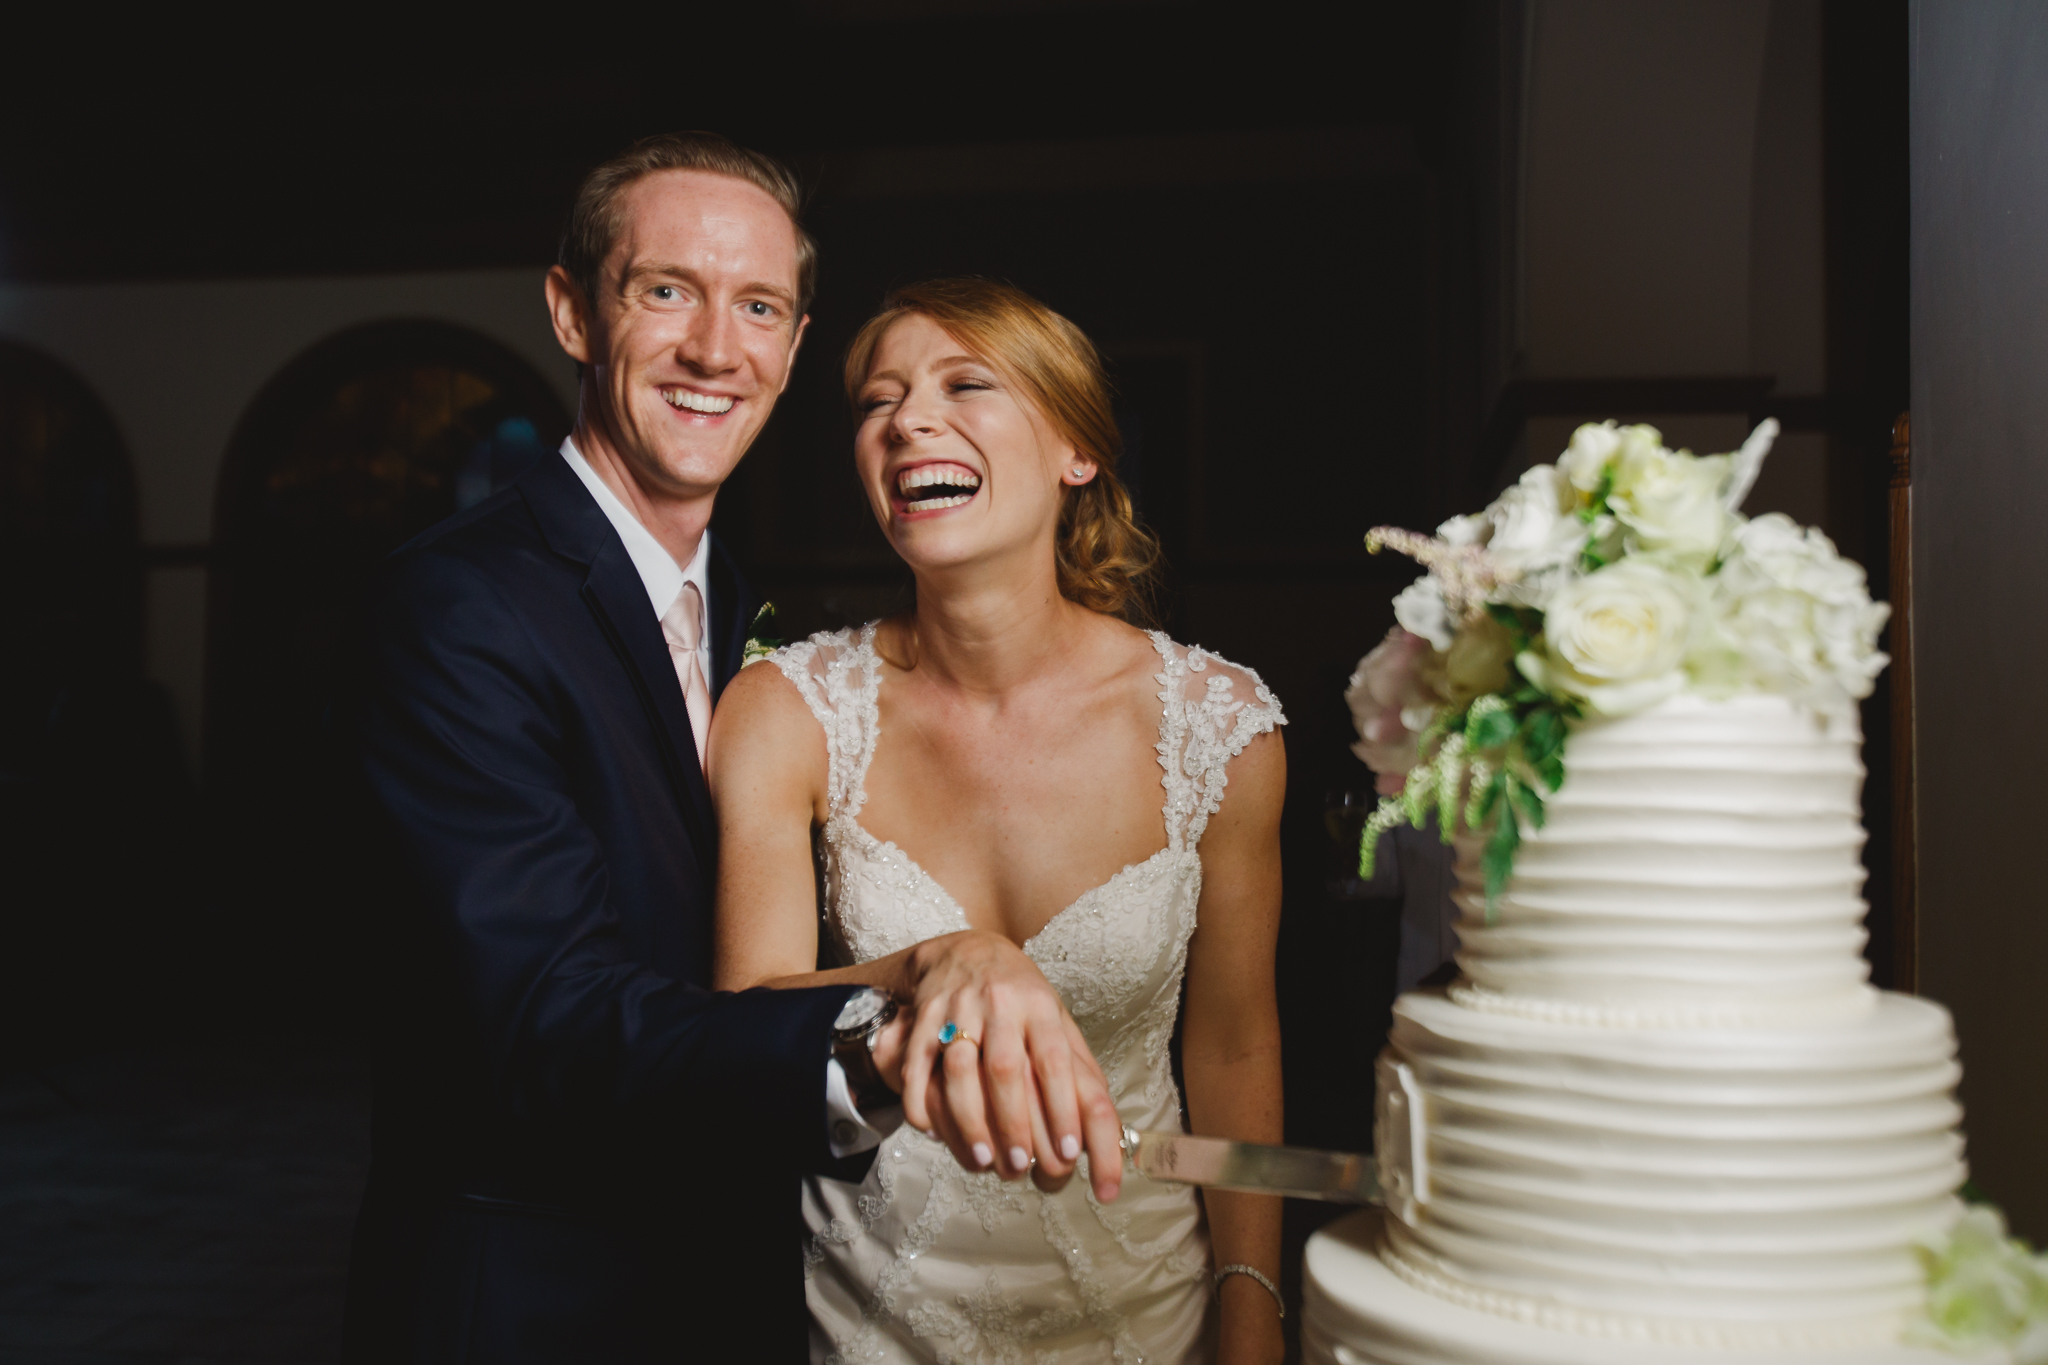 Michael and Kelly - the ashton depot - wedding DFW - wedding photographer- elizalde photography (118 of 150).jpg